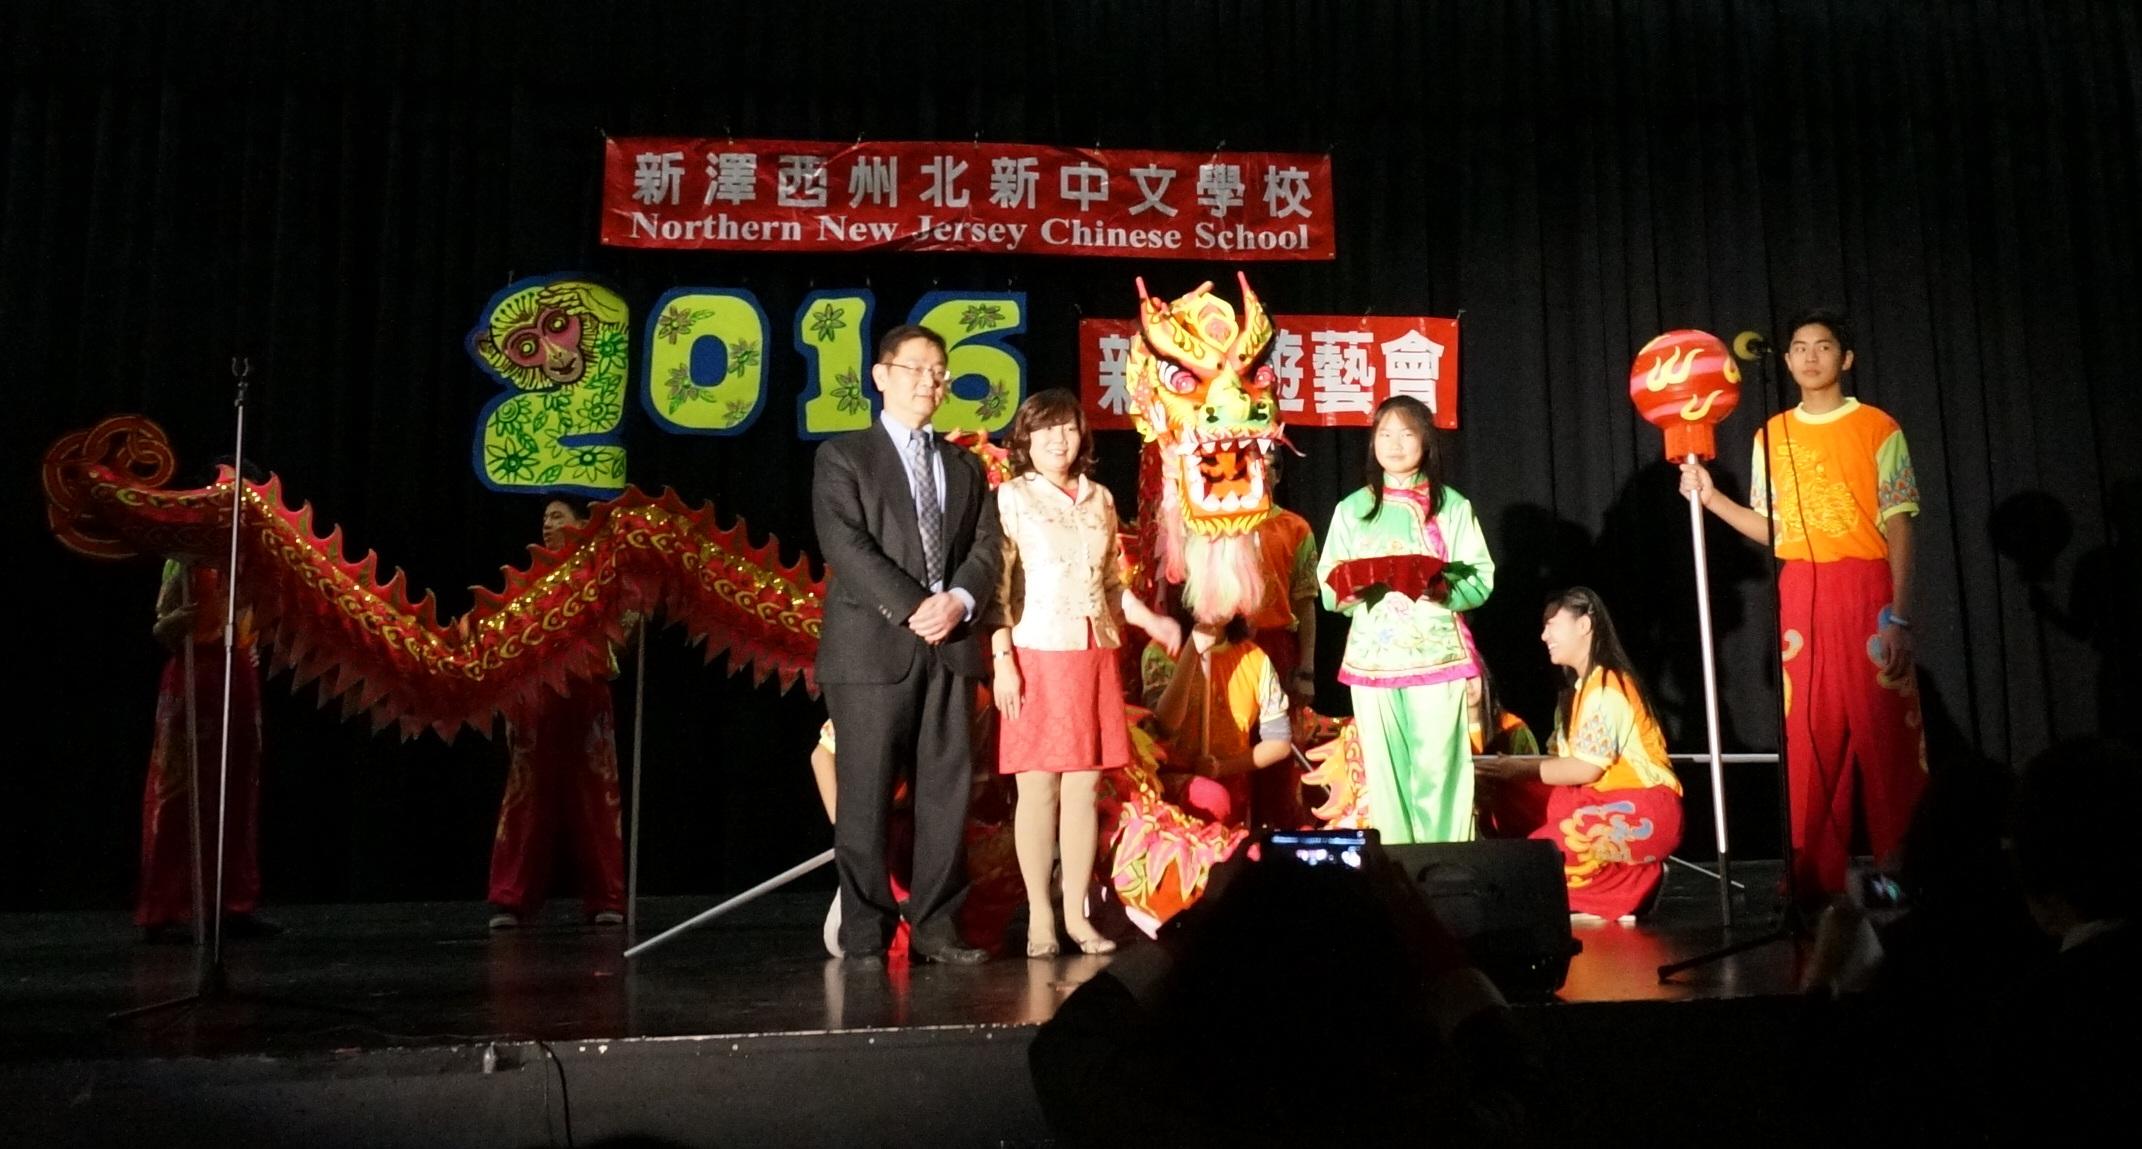 47ea844b025074956d15_aaa_Chinese_New_Year_pix_021.JPG